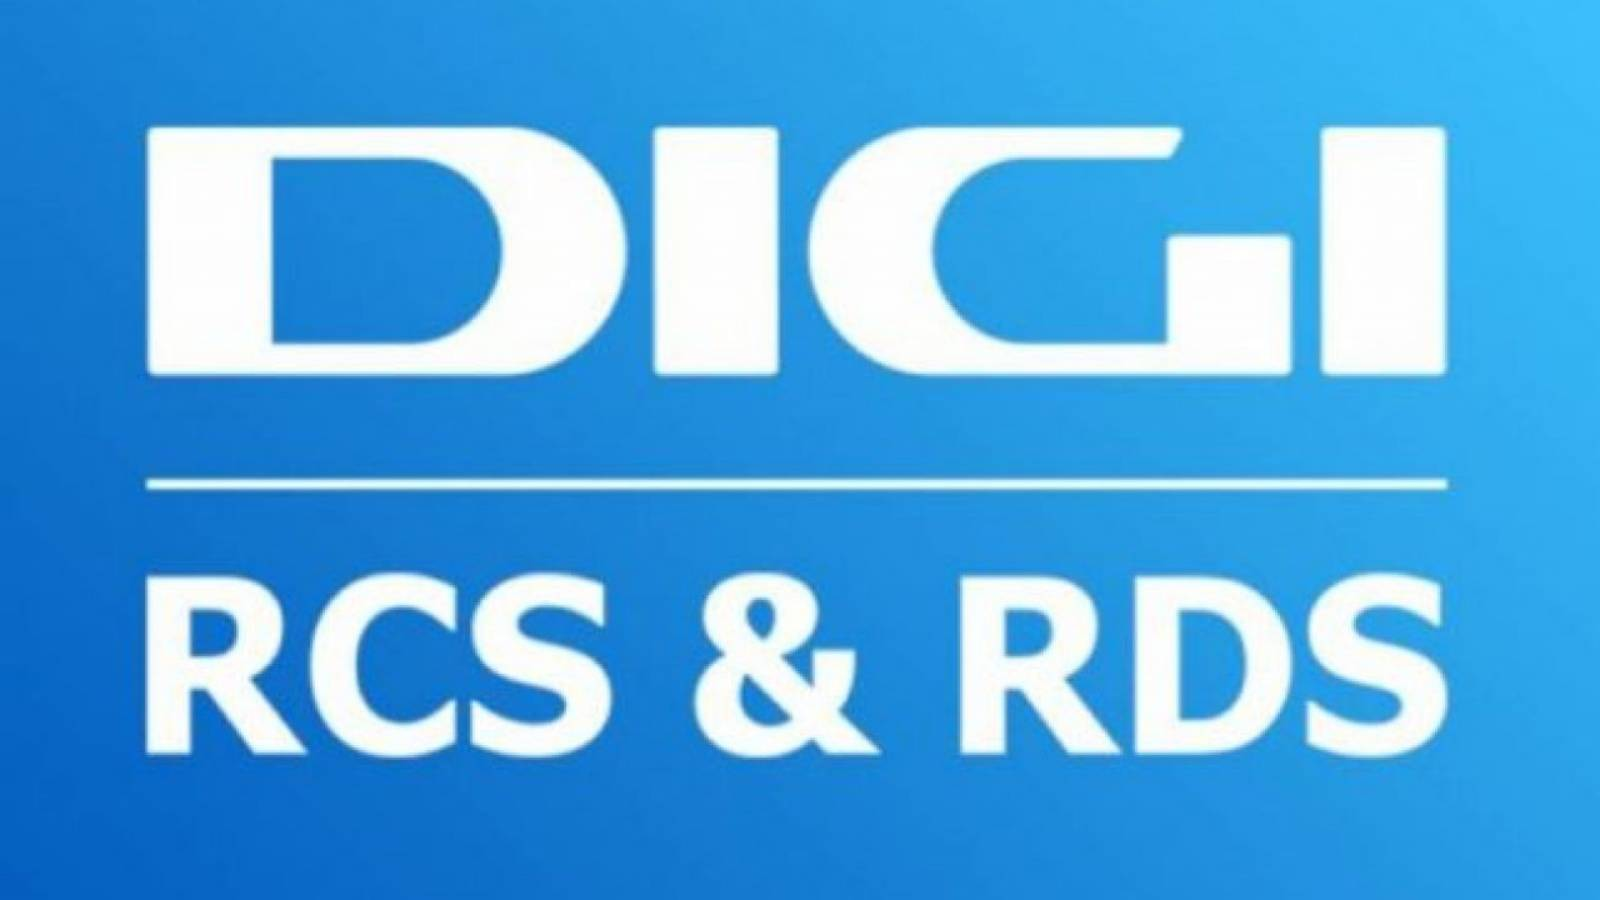 RCS & RDS multumire